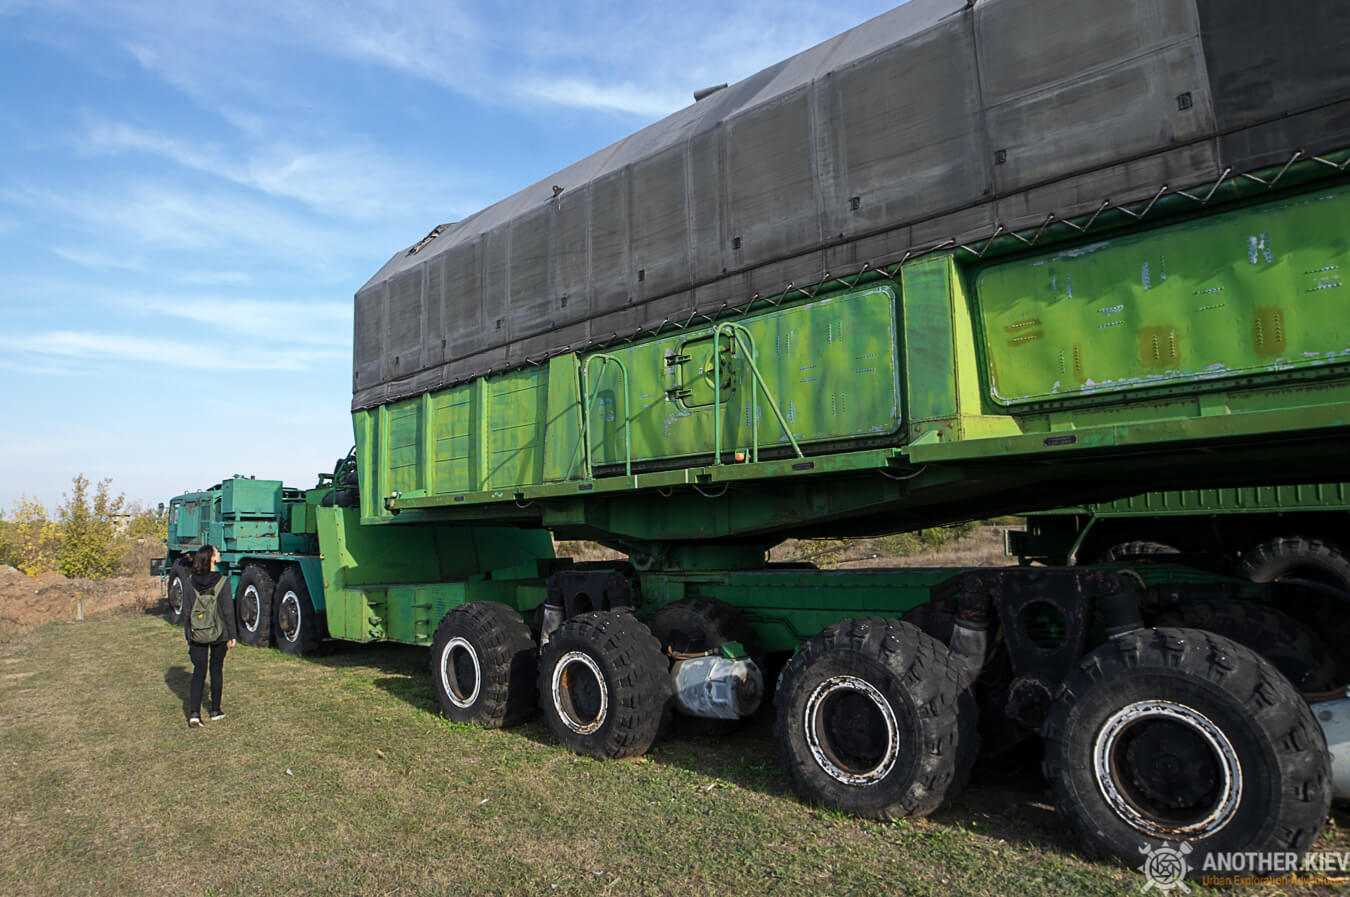 Missilo-6223 Missile Base Tour